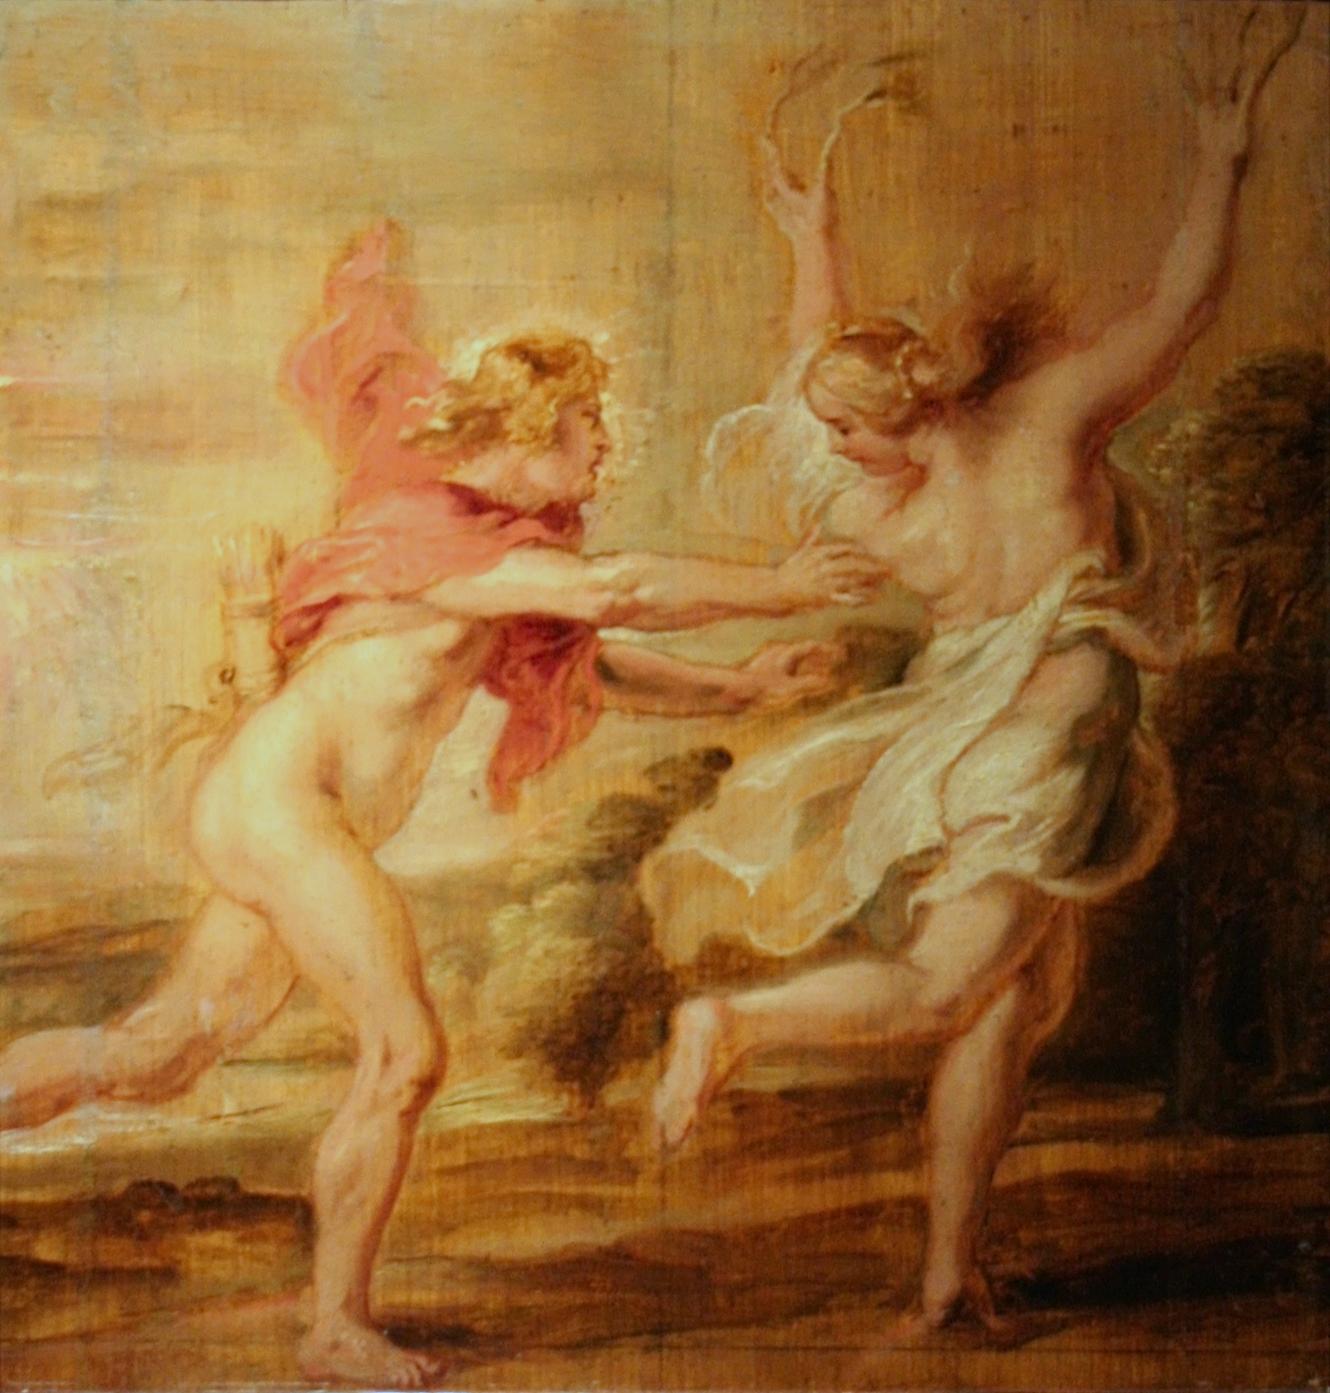 Dorothy Lamour - Wikipedia Vetement fashion pour bebe